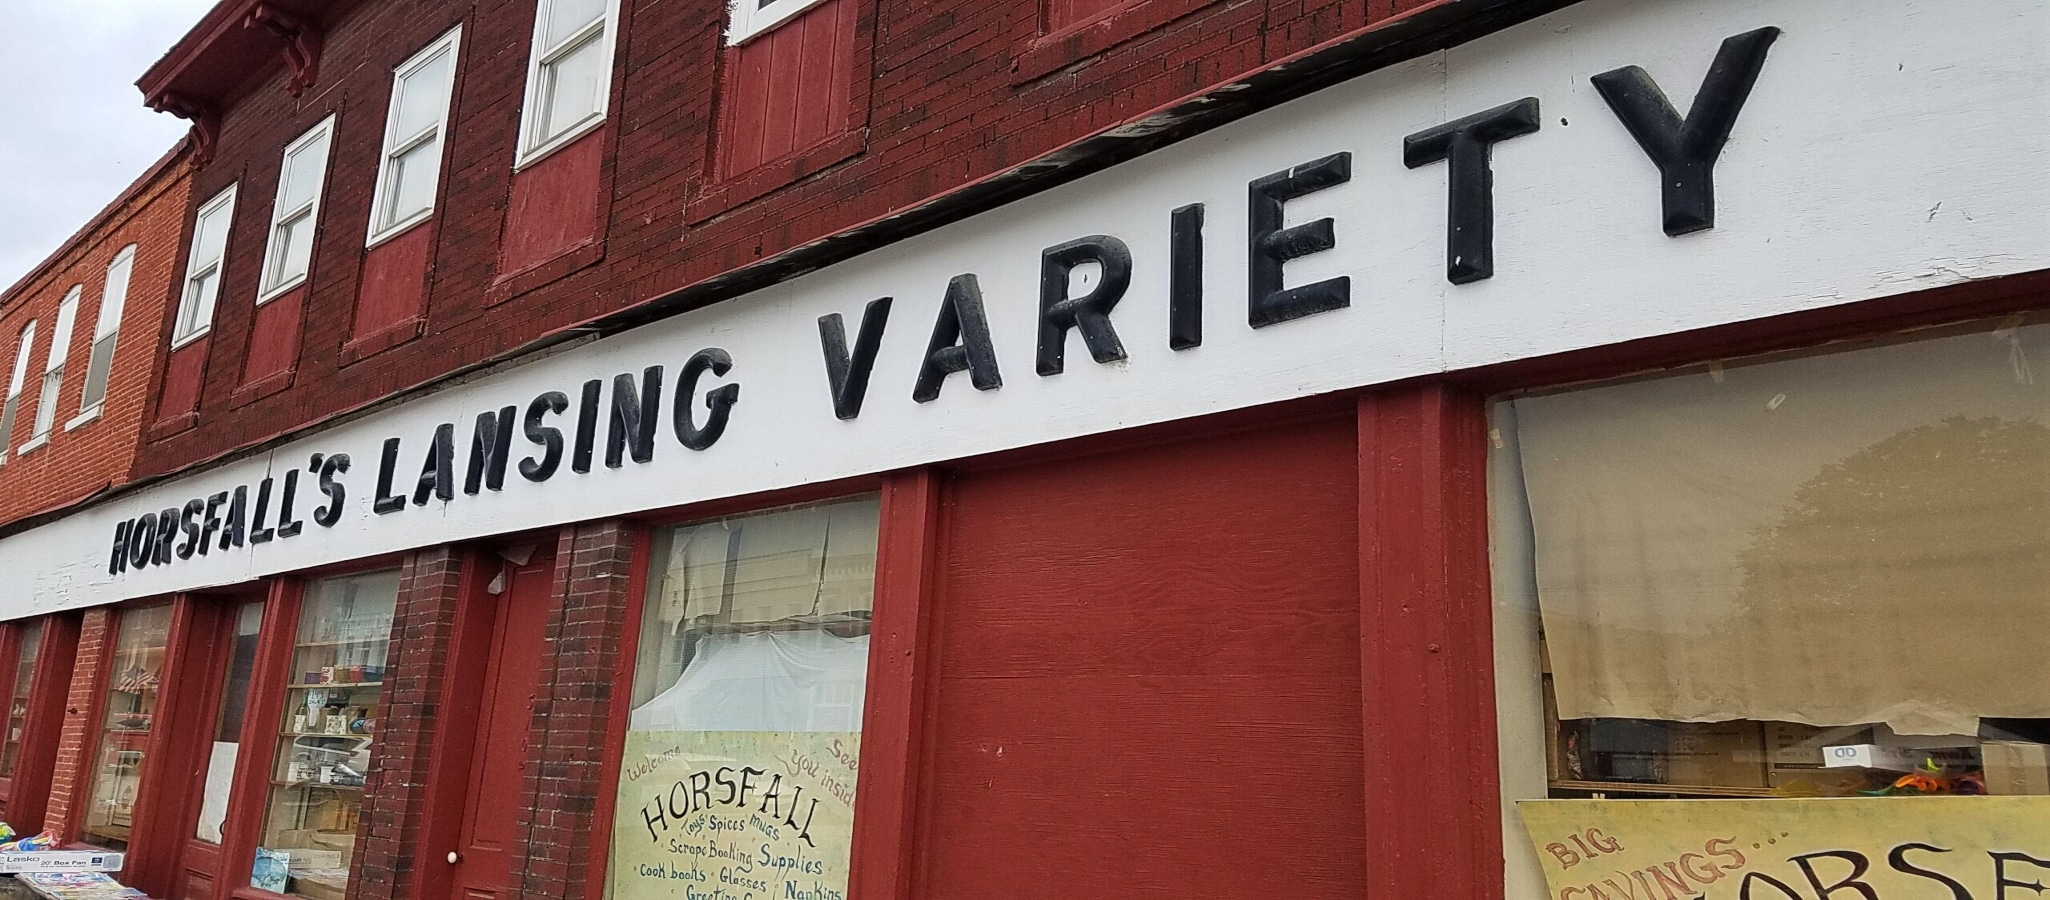 Horsfall's Store Lansing